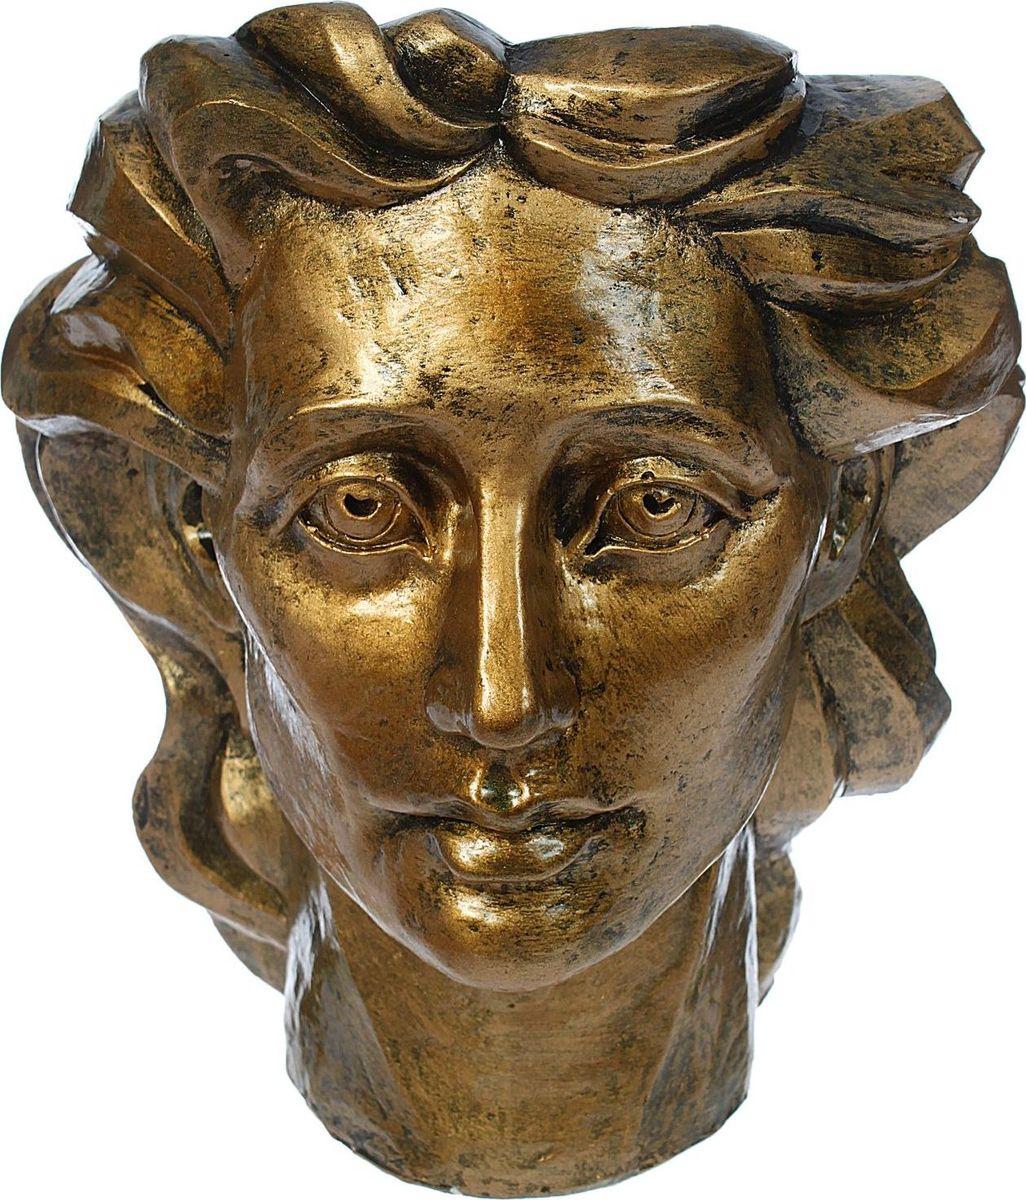 Кашпо Голова женщины, цвет: бронзовый, 23 х 27 х 32 см1374809